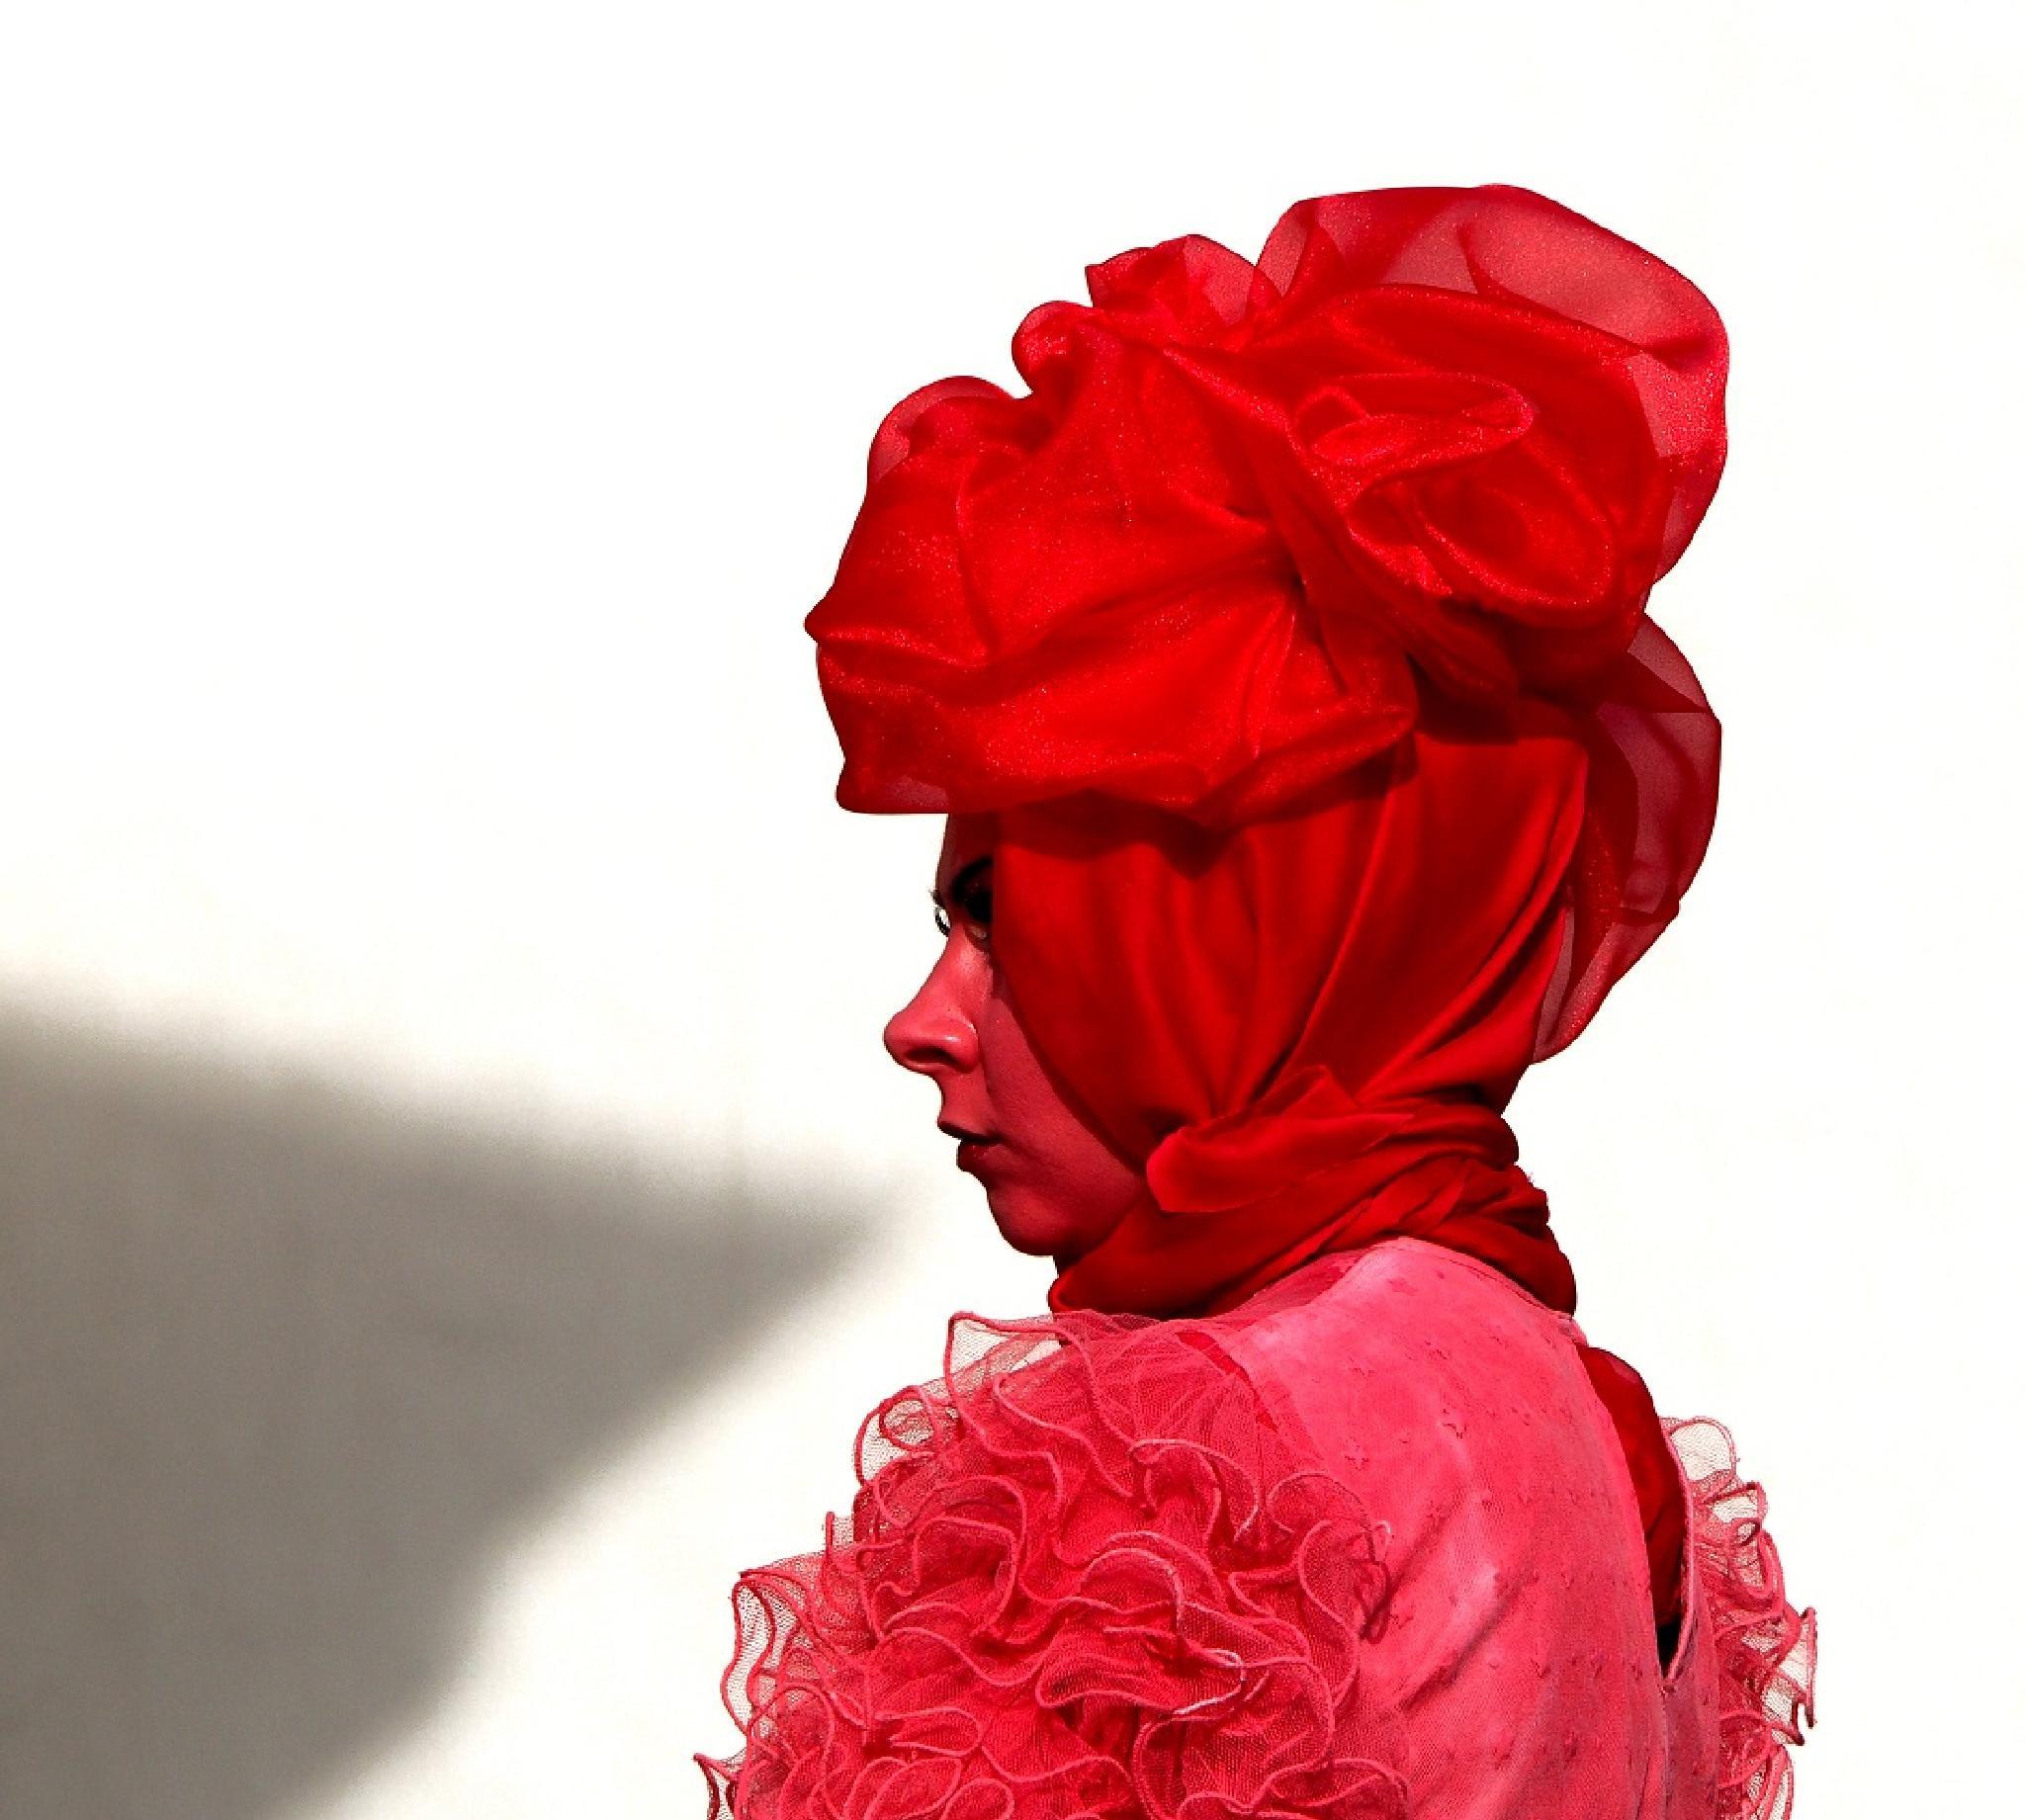 -lady in red- by rytis.vilnietis